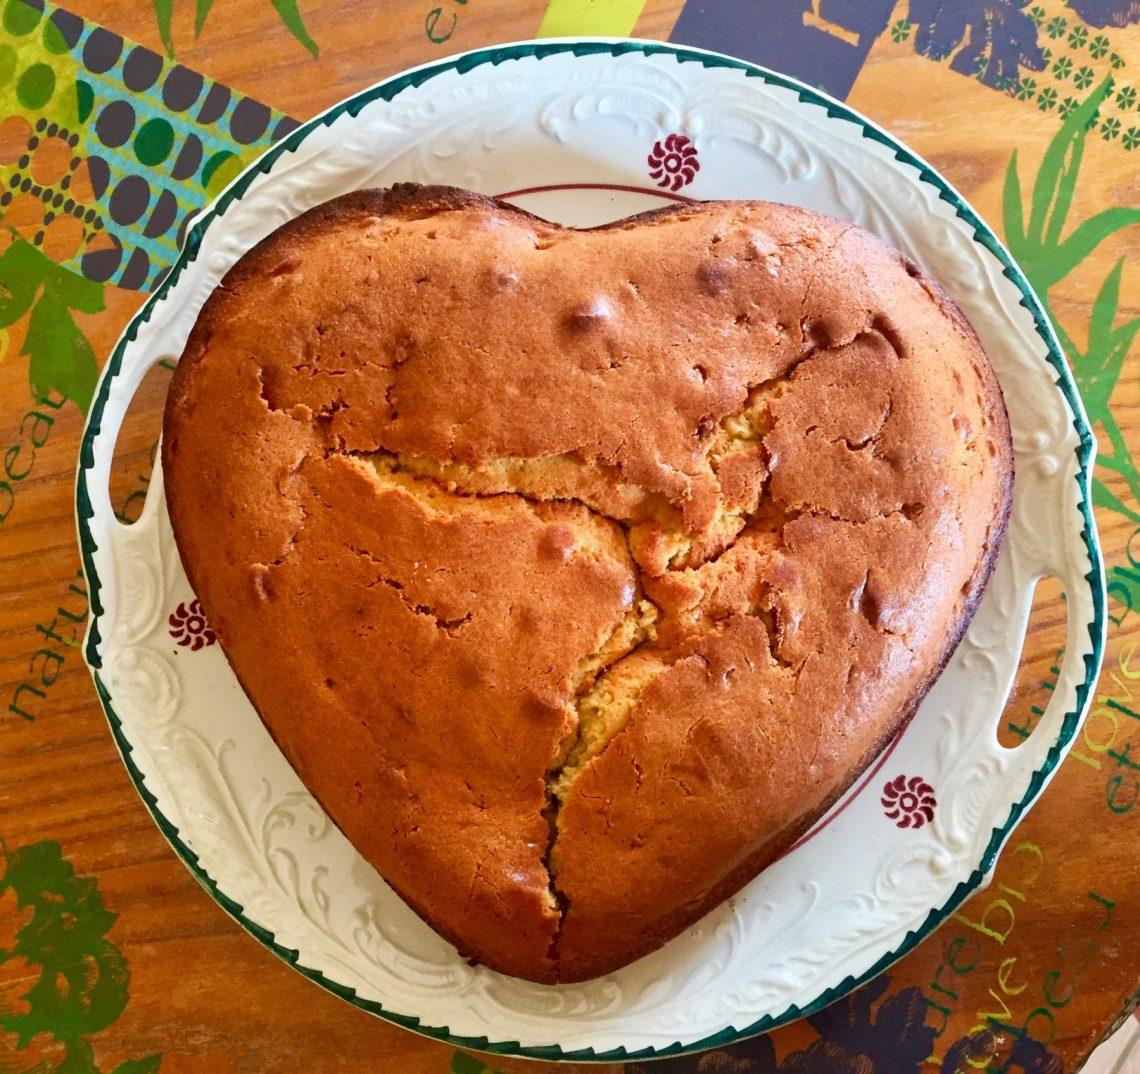 IMG 3381 - Gâteau italien citron et mascarpone